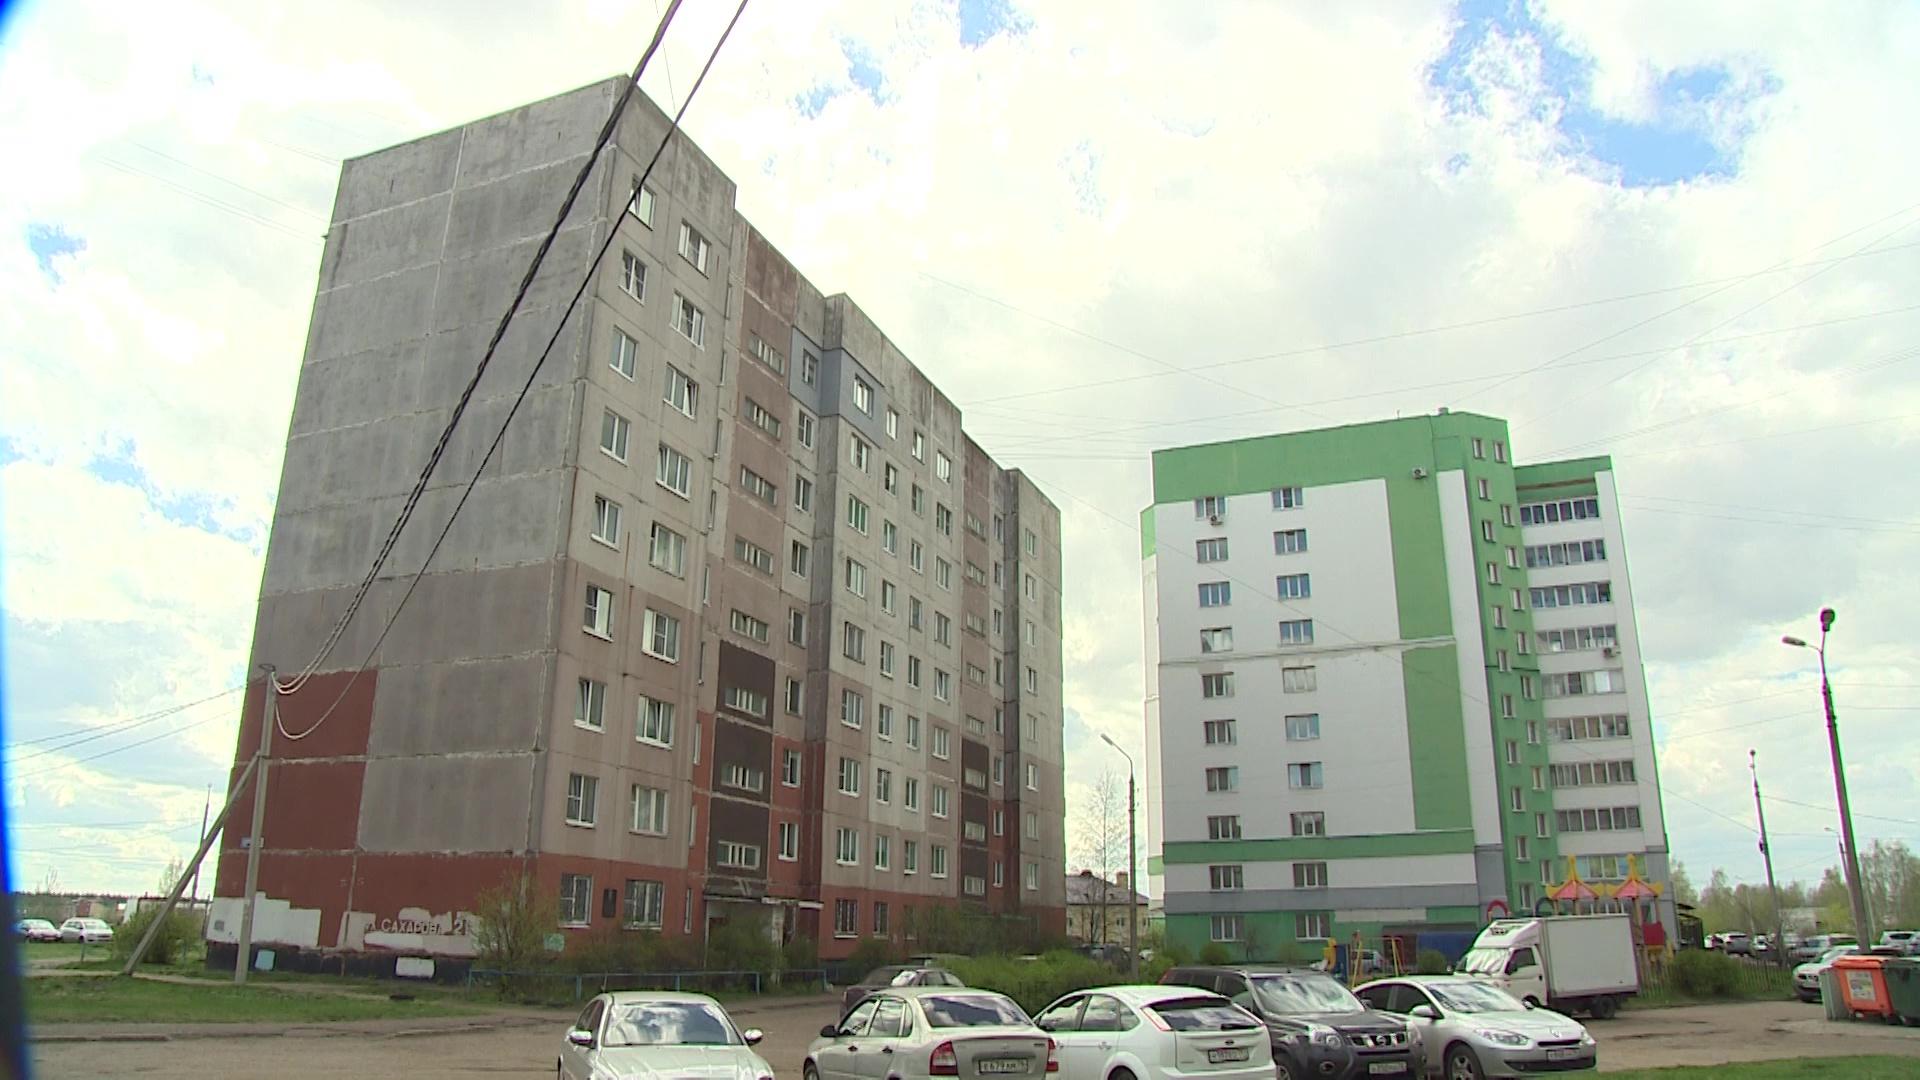 В девятиэтажном доме на Сахарова в Ярославле заменили лифт